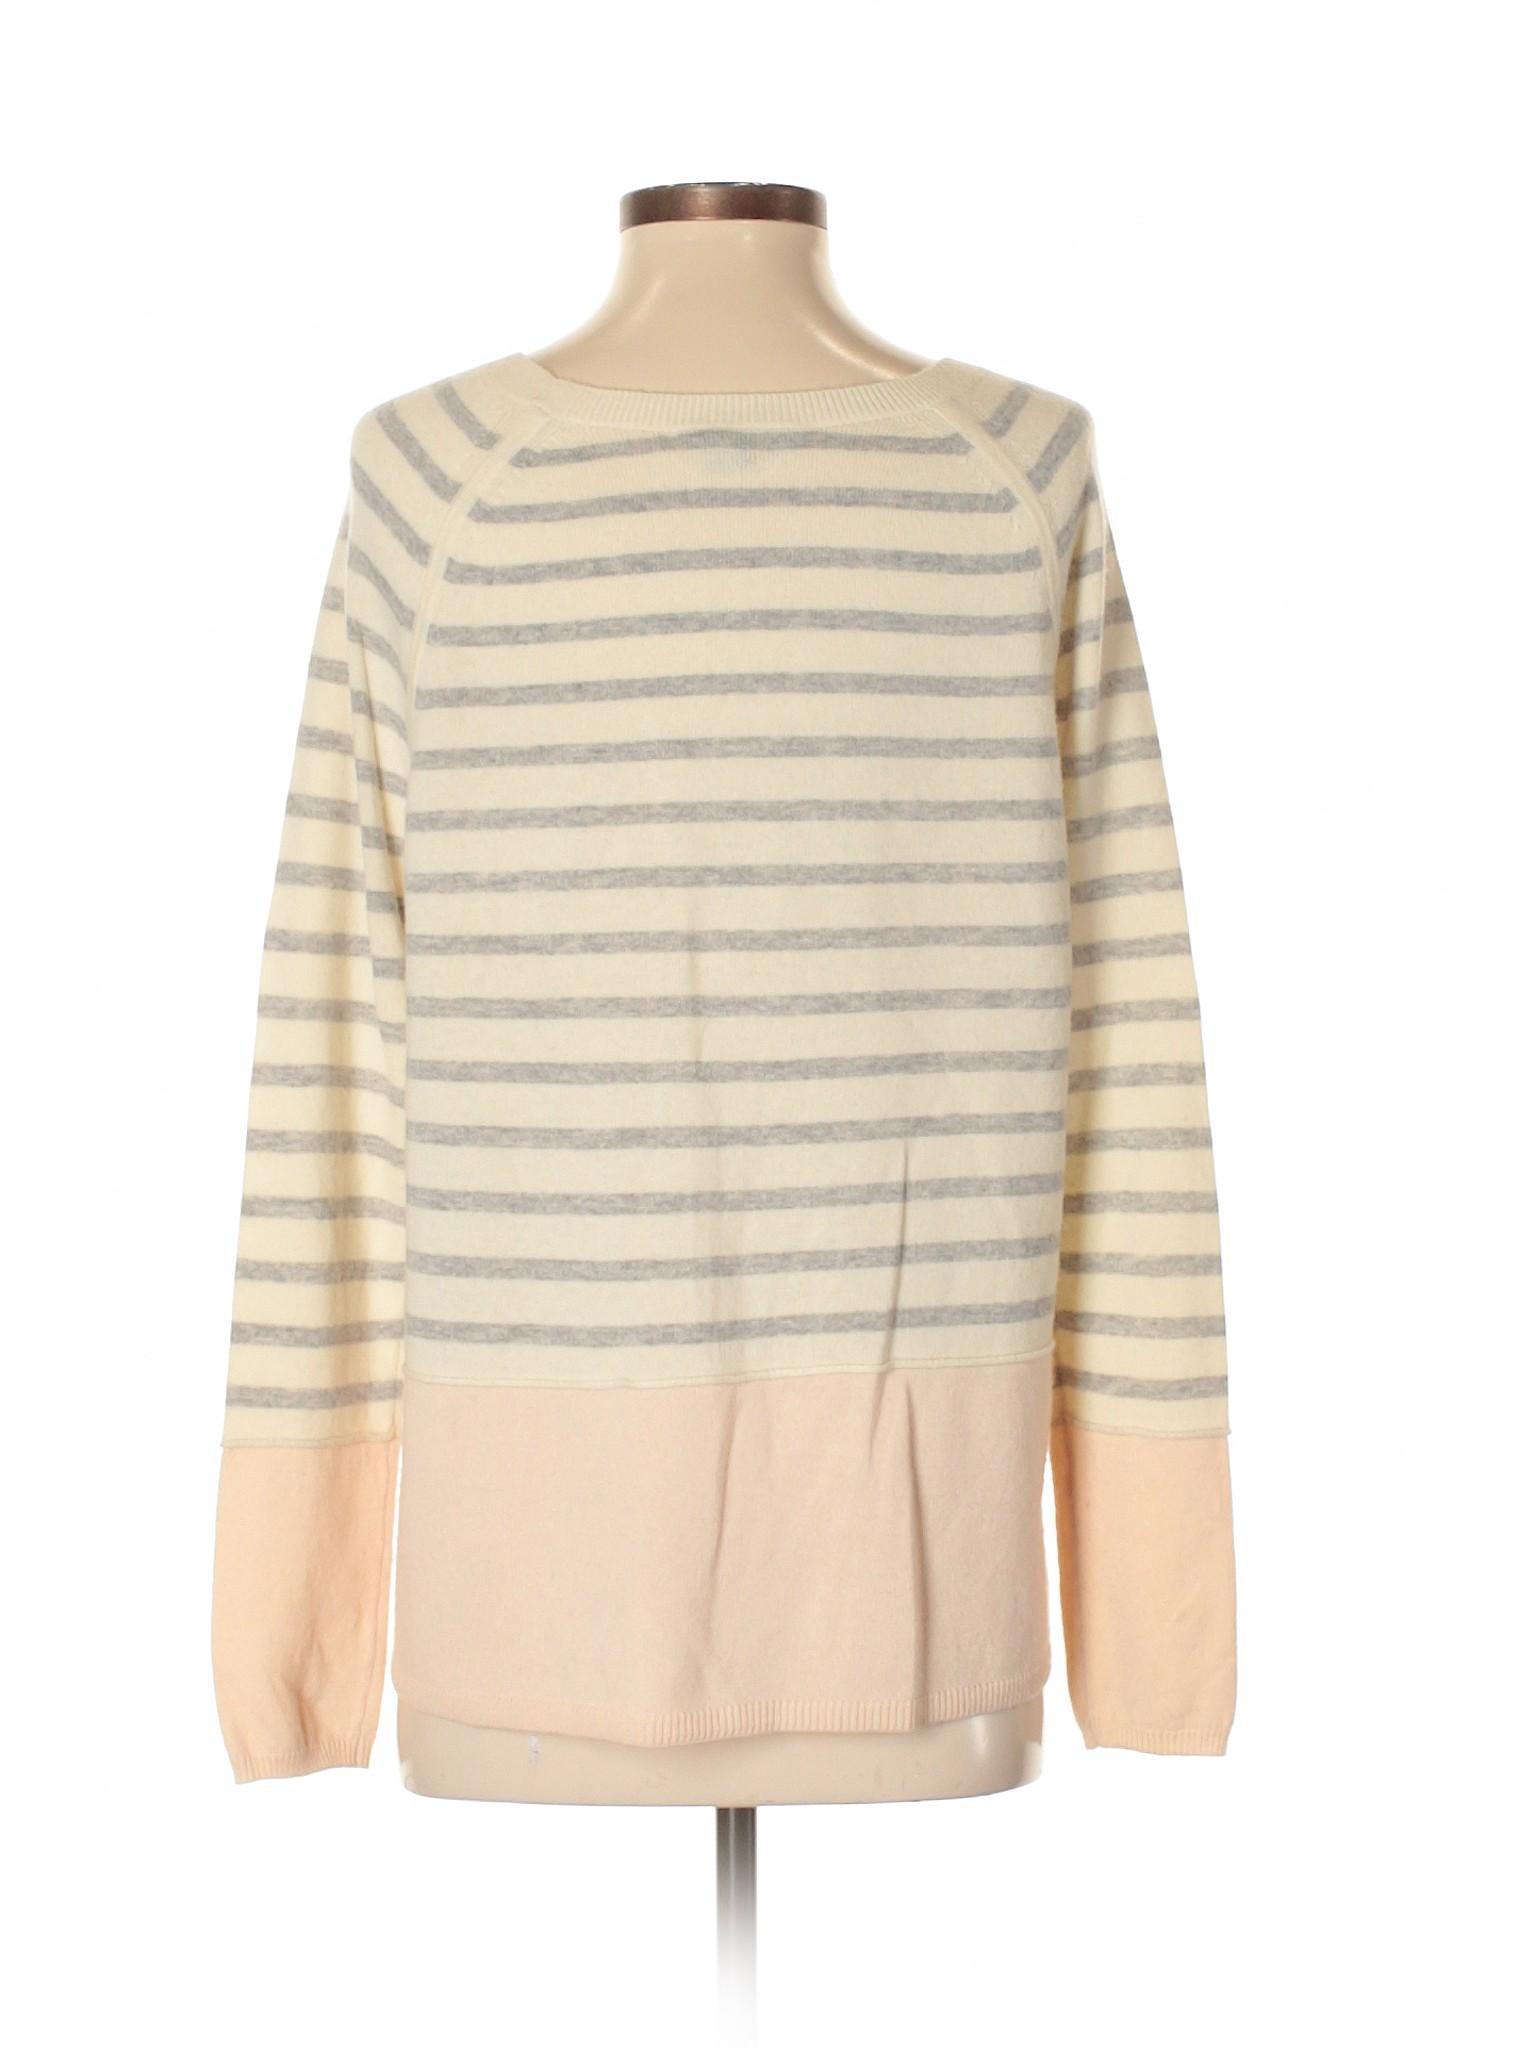 Vince Pullover Boutique Boutique Wool Sweater Vince HIEIF6